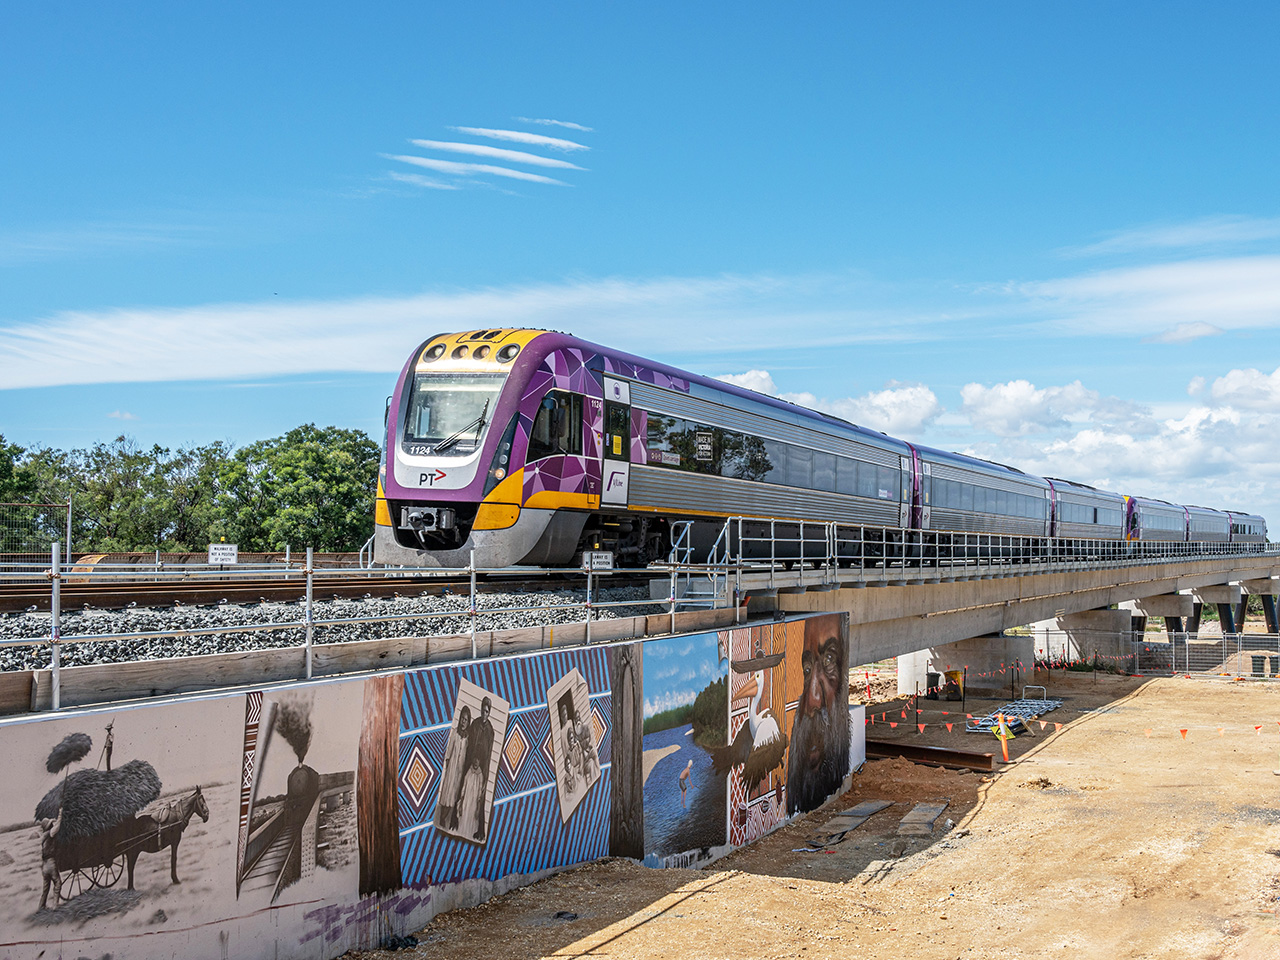 Vlocity train using the new bridge over the Avon River